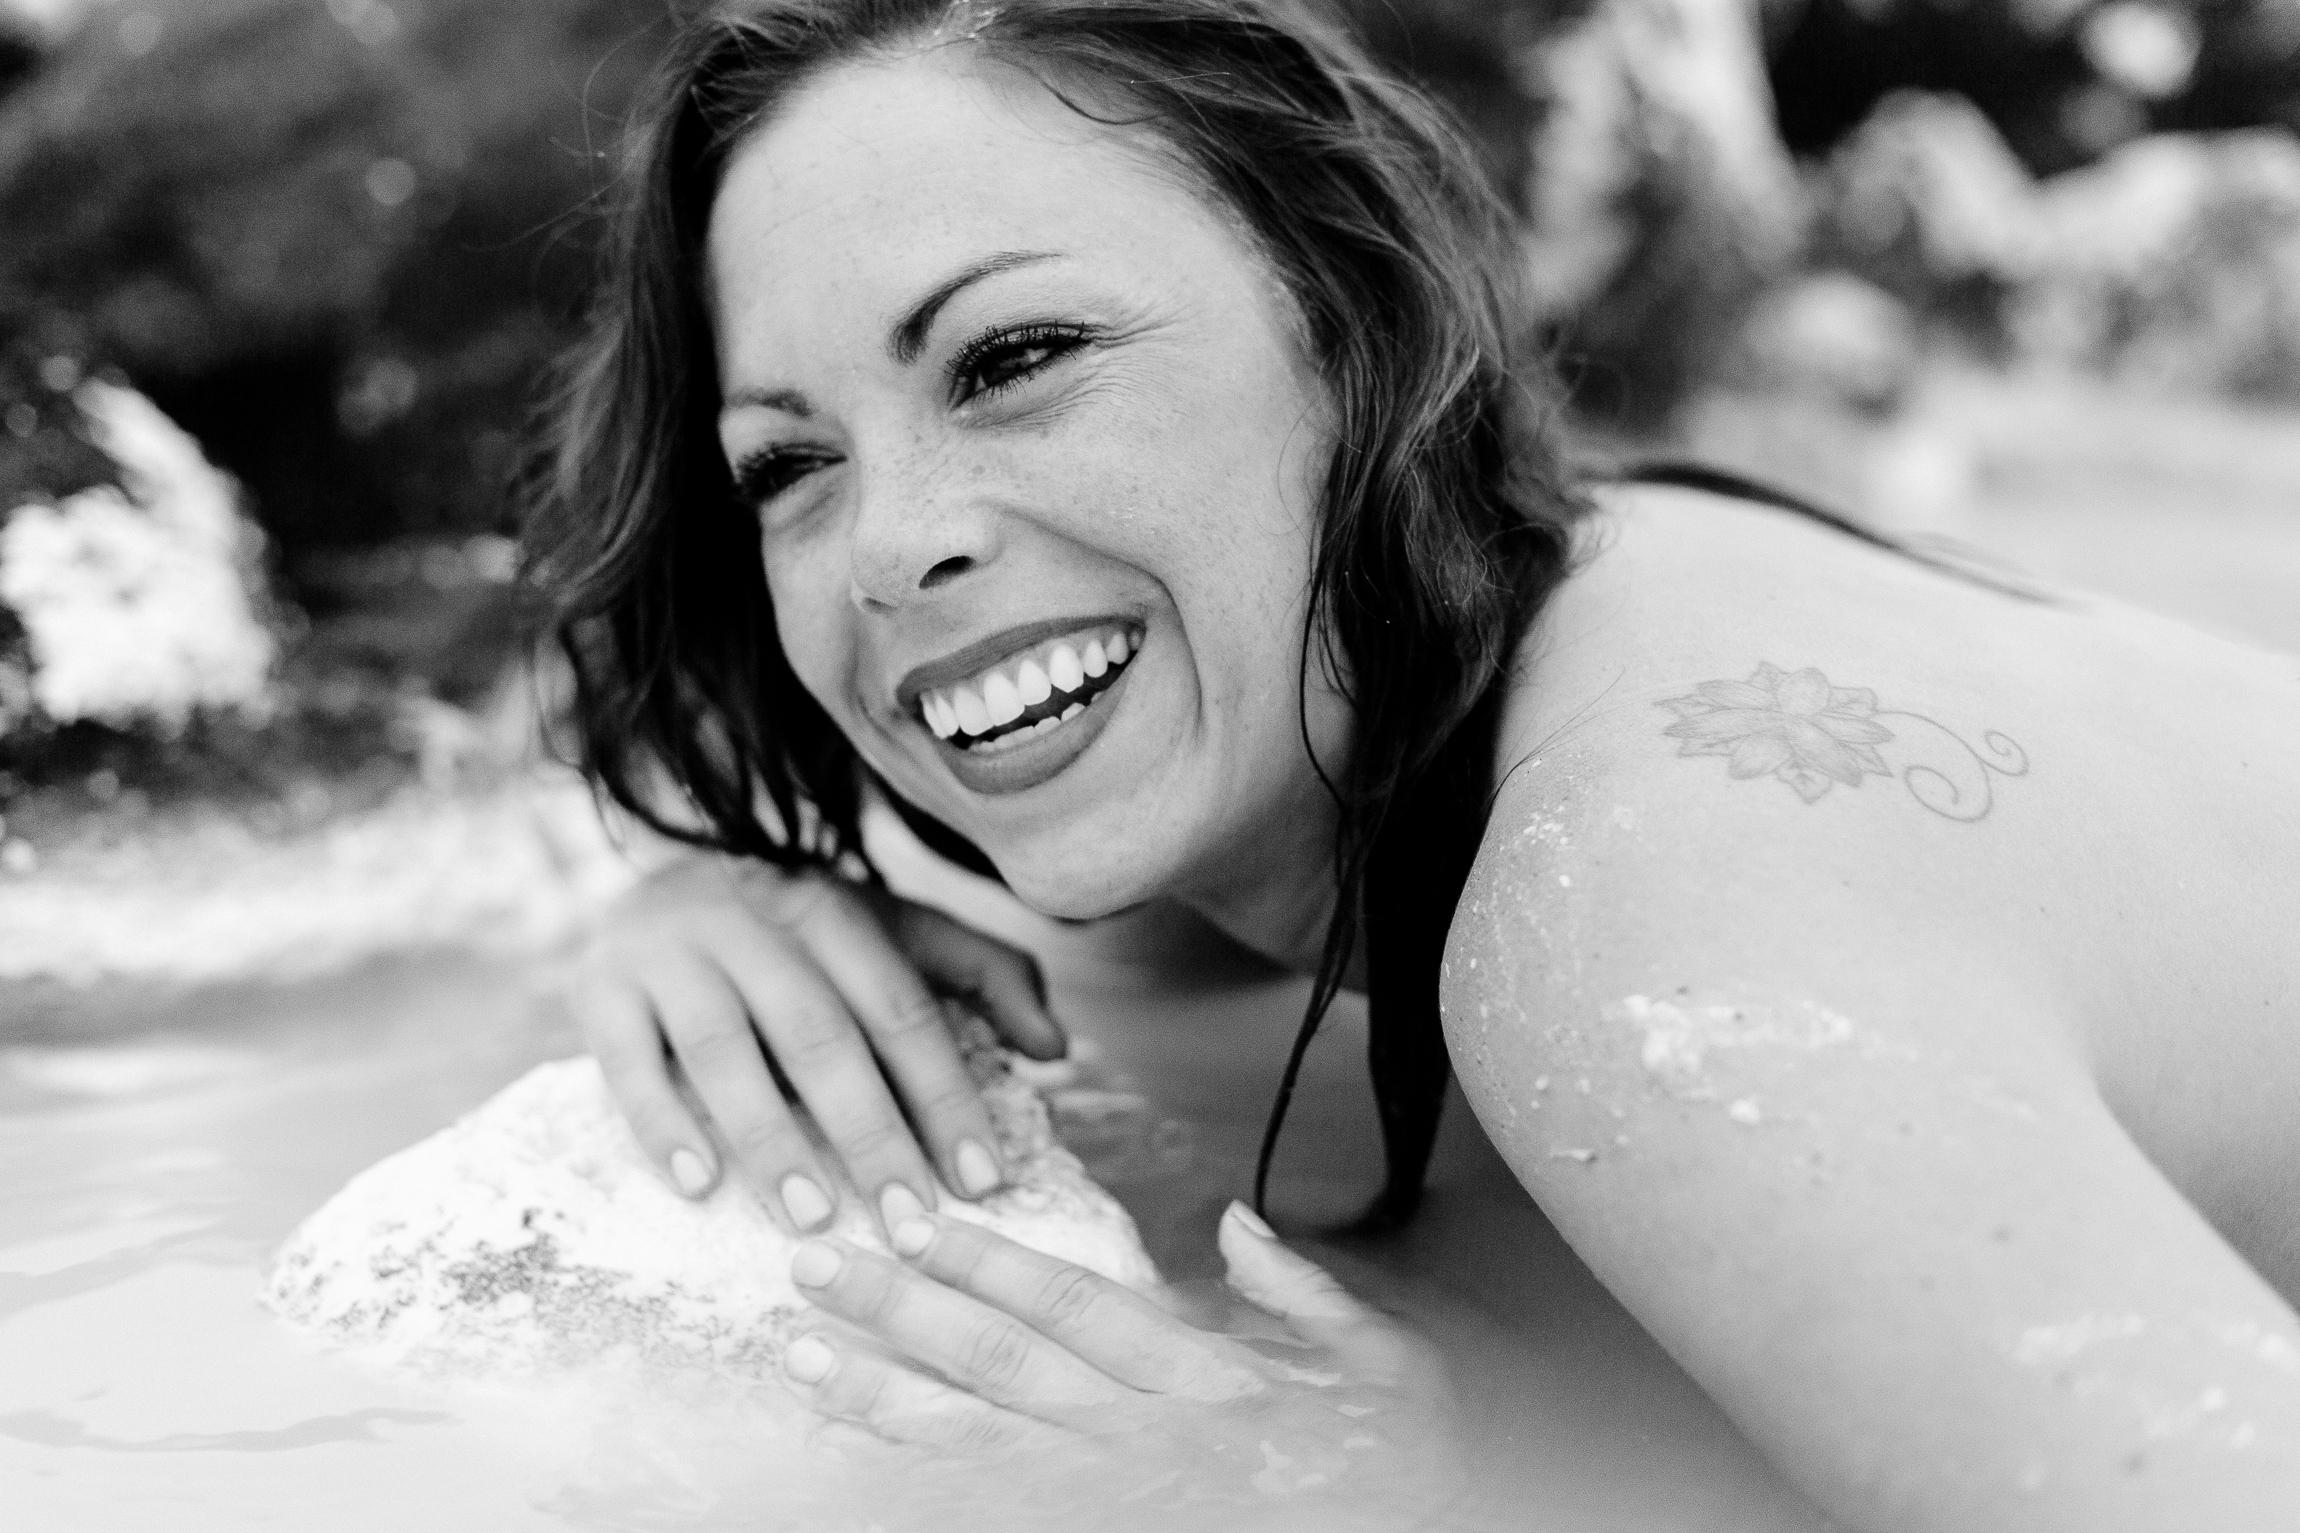 Jen_Montgomery_Photography_Lagoon_Blue_Iceland_Angie-7.jpg